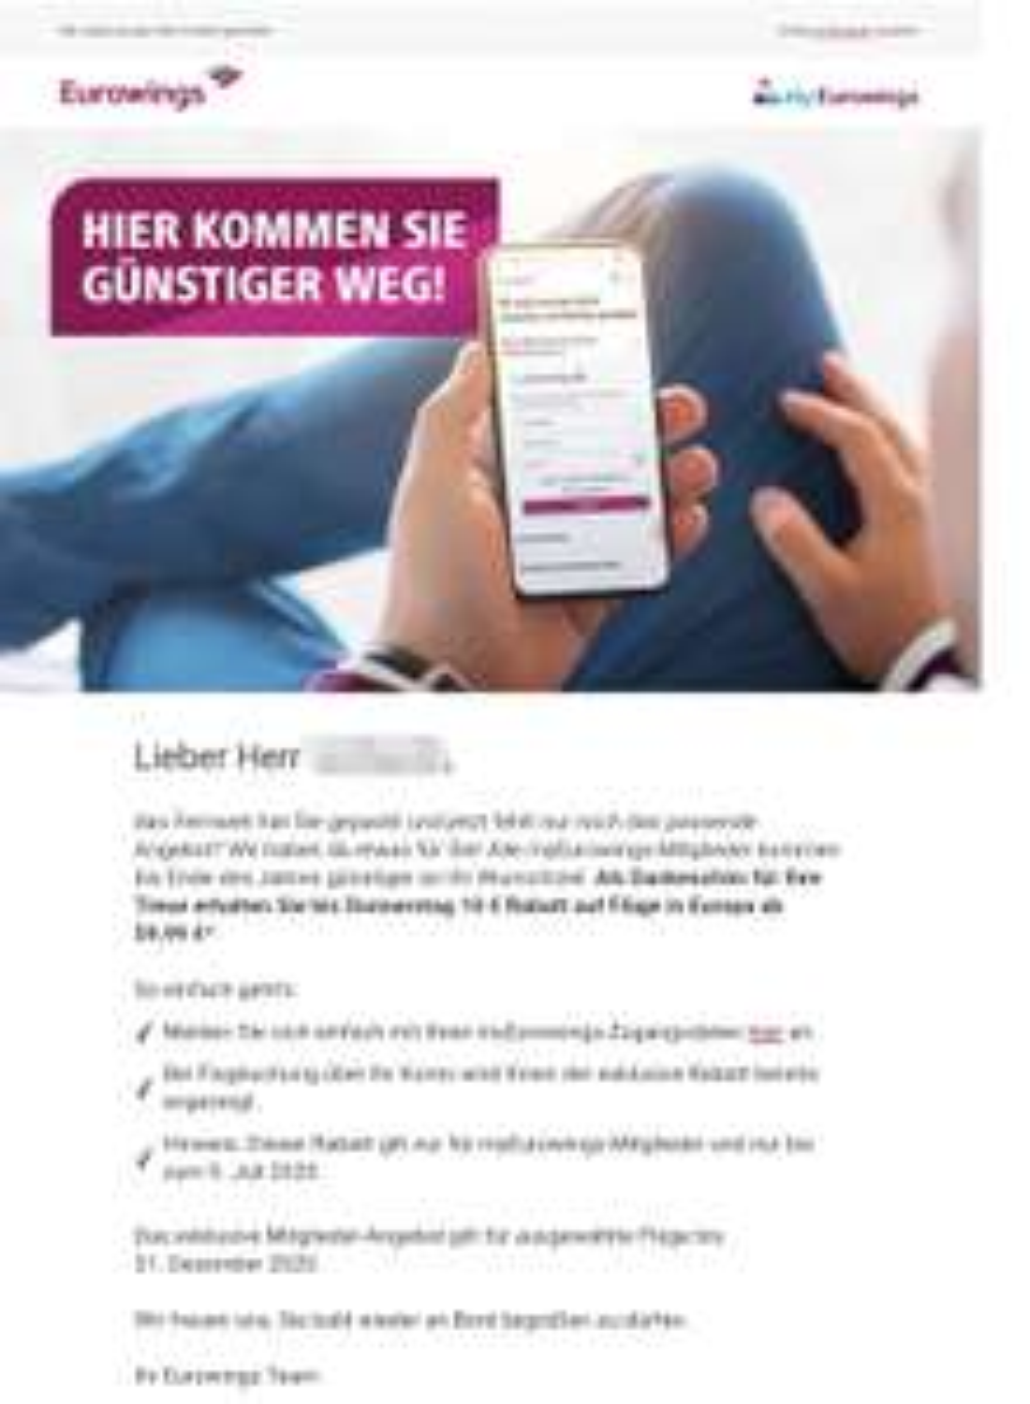 Eurowings 10€ Rabatt für eurowings mitglieder ab 59,99 €